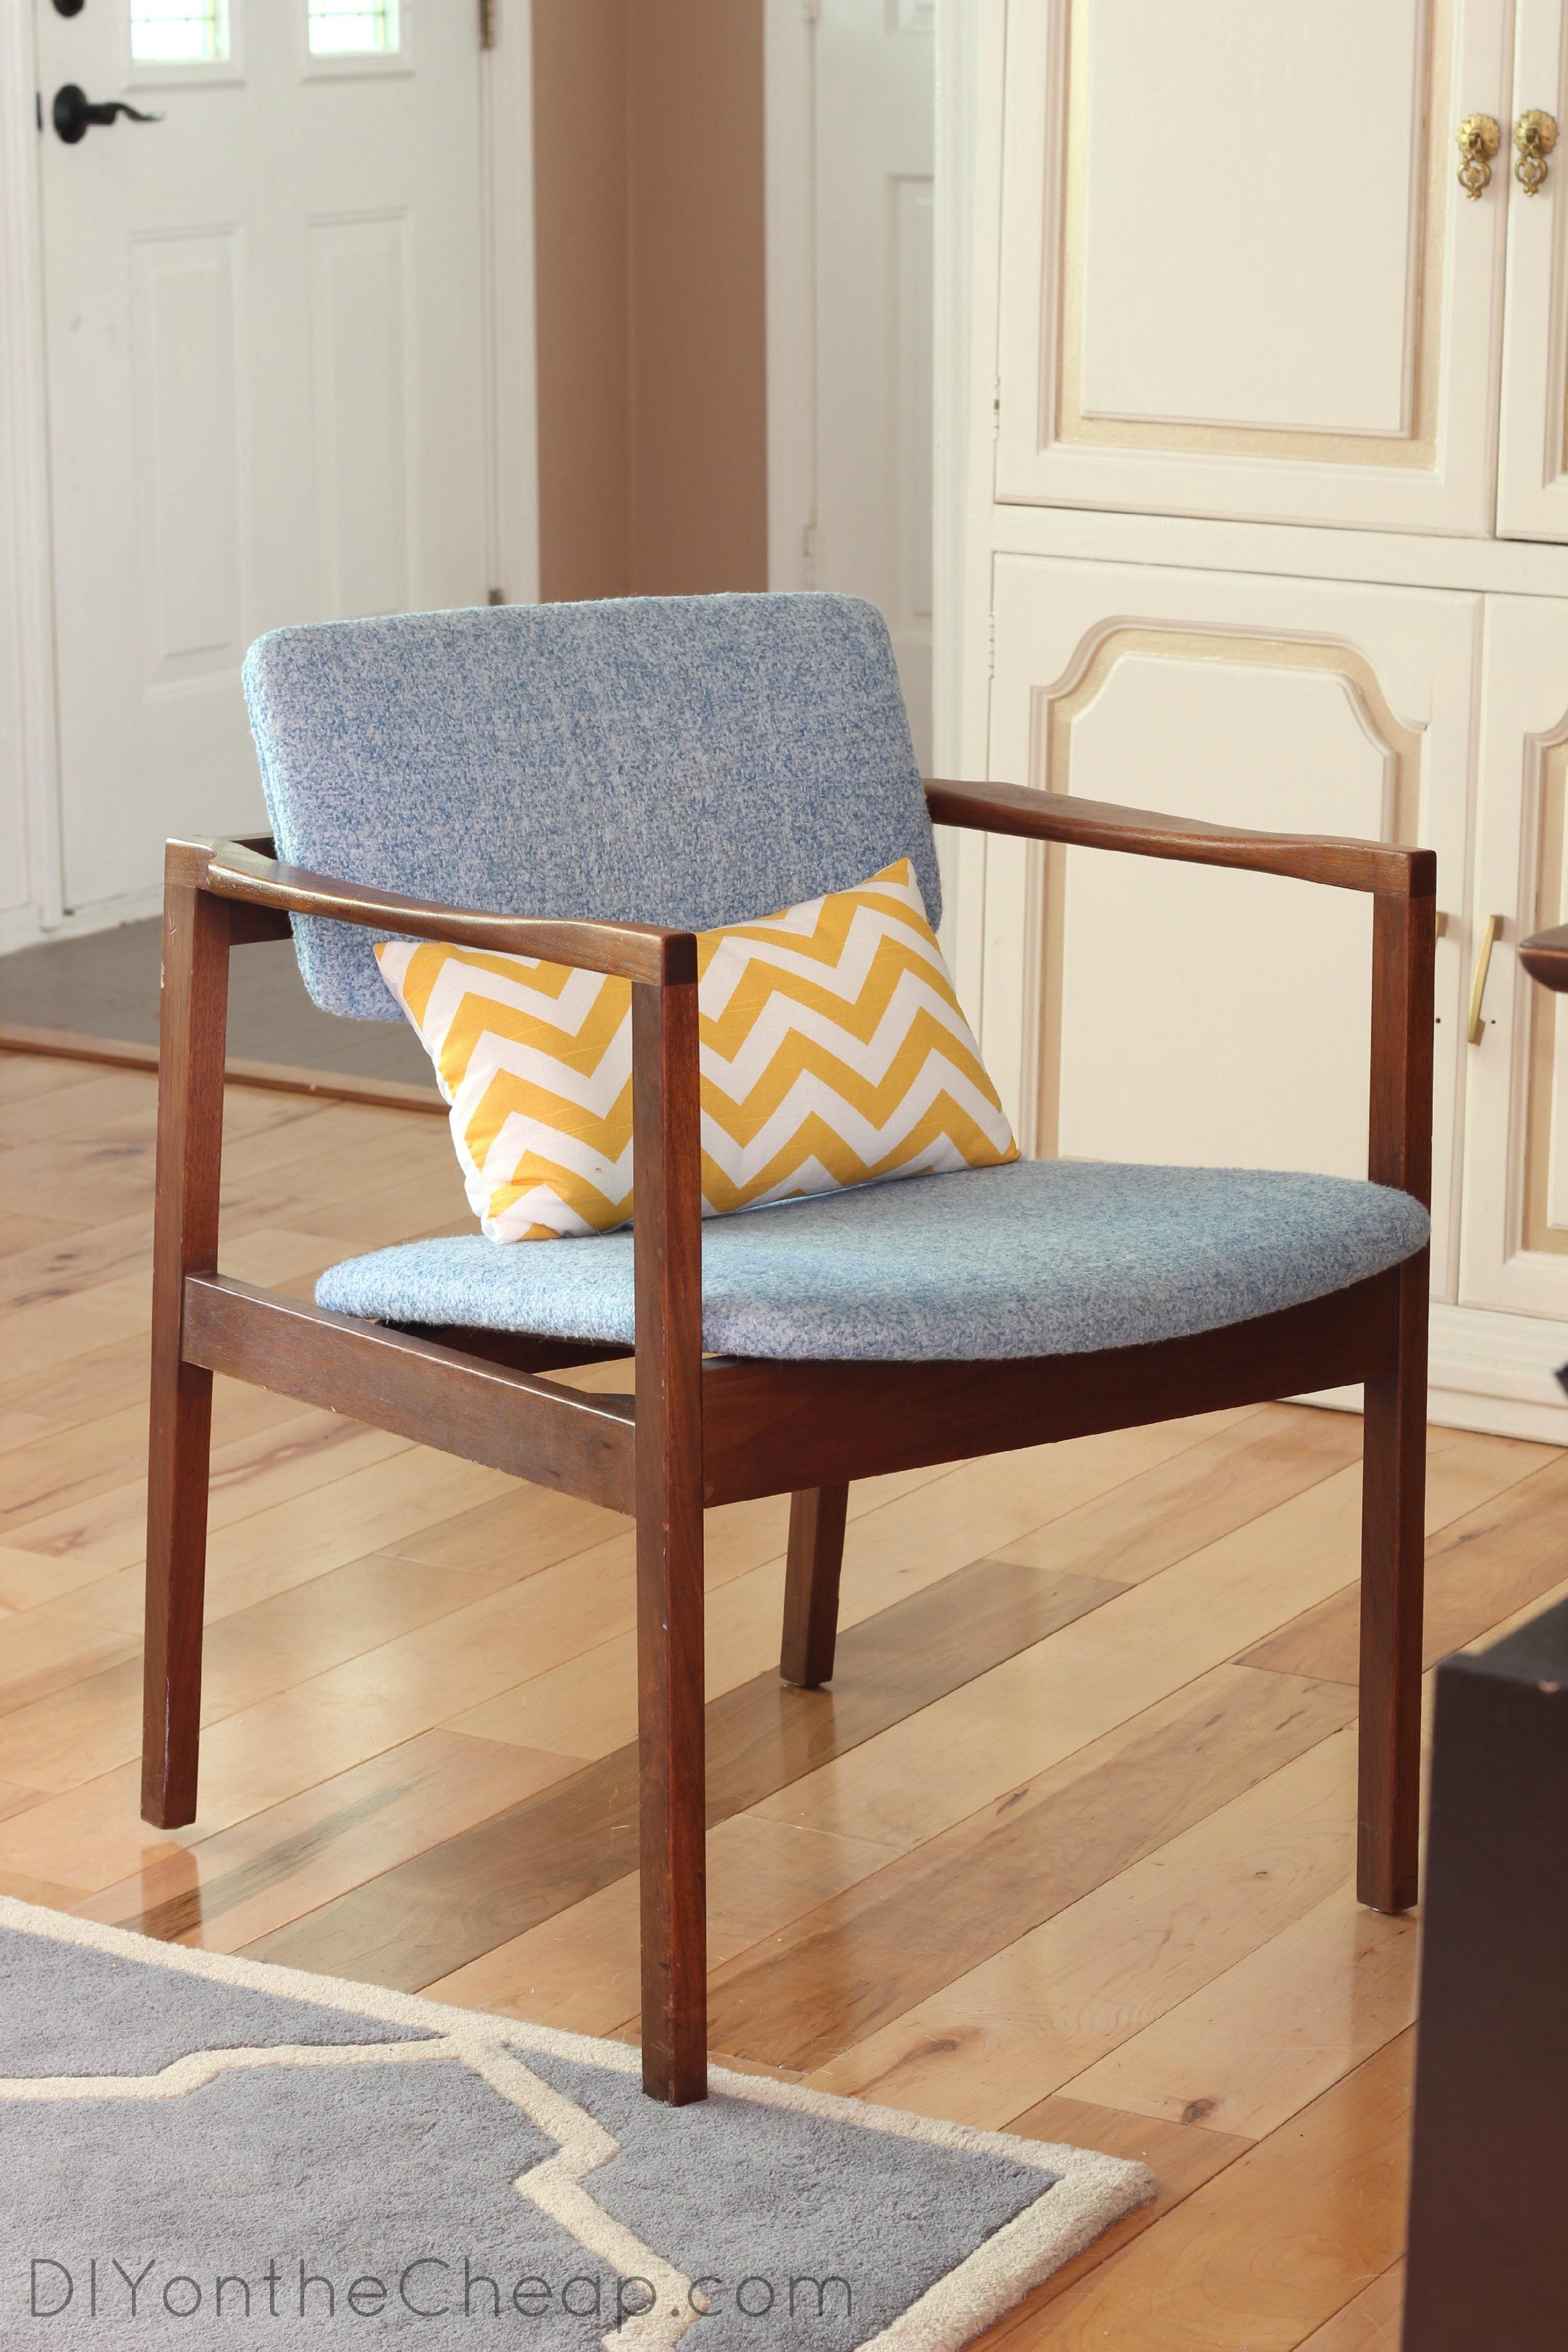 desk chair diy folding bed new office flea market furniture find erin spain